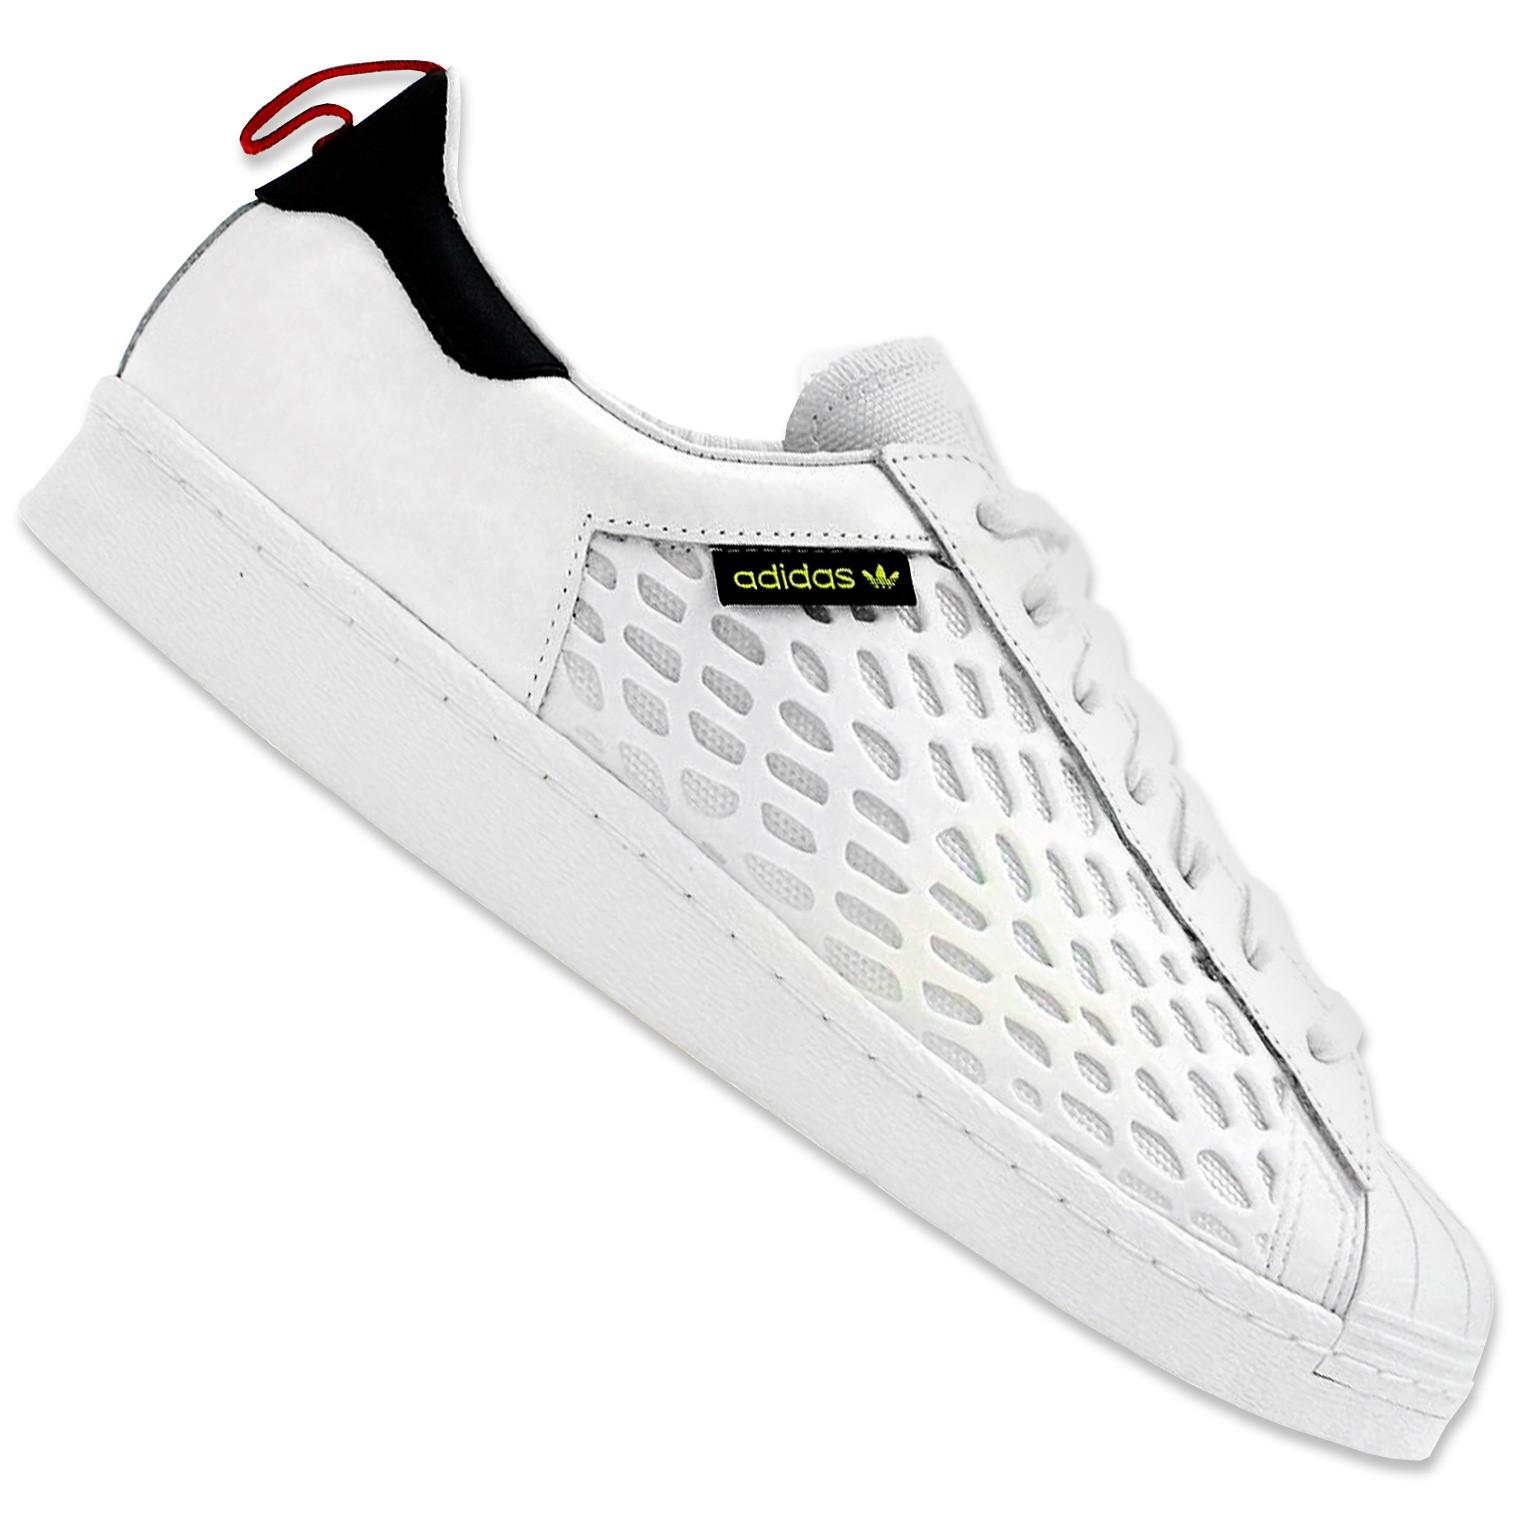 adidas originals superstar 80s shield sneaker 2 schuhe. Black Bedroom Furniture Sets. Home Design Ideas